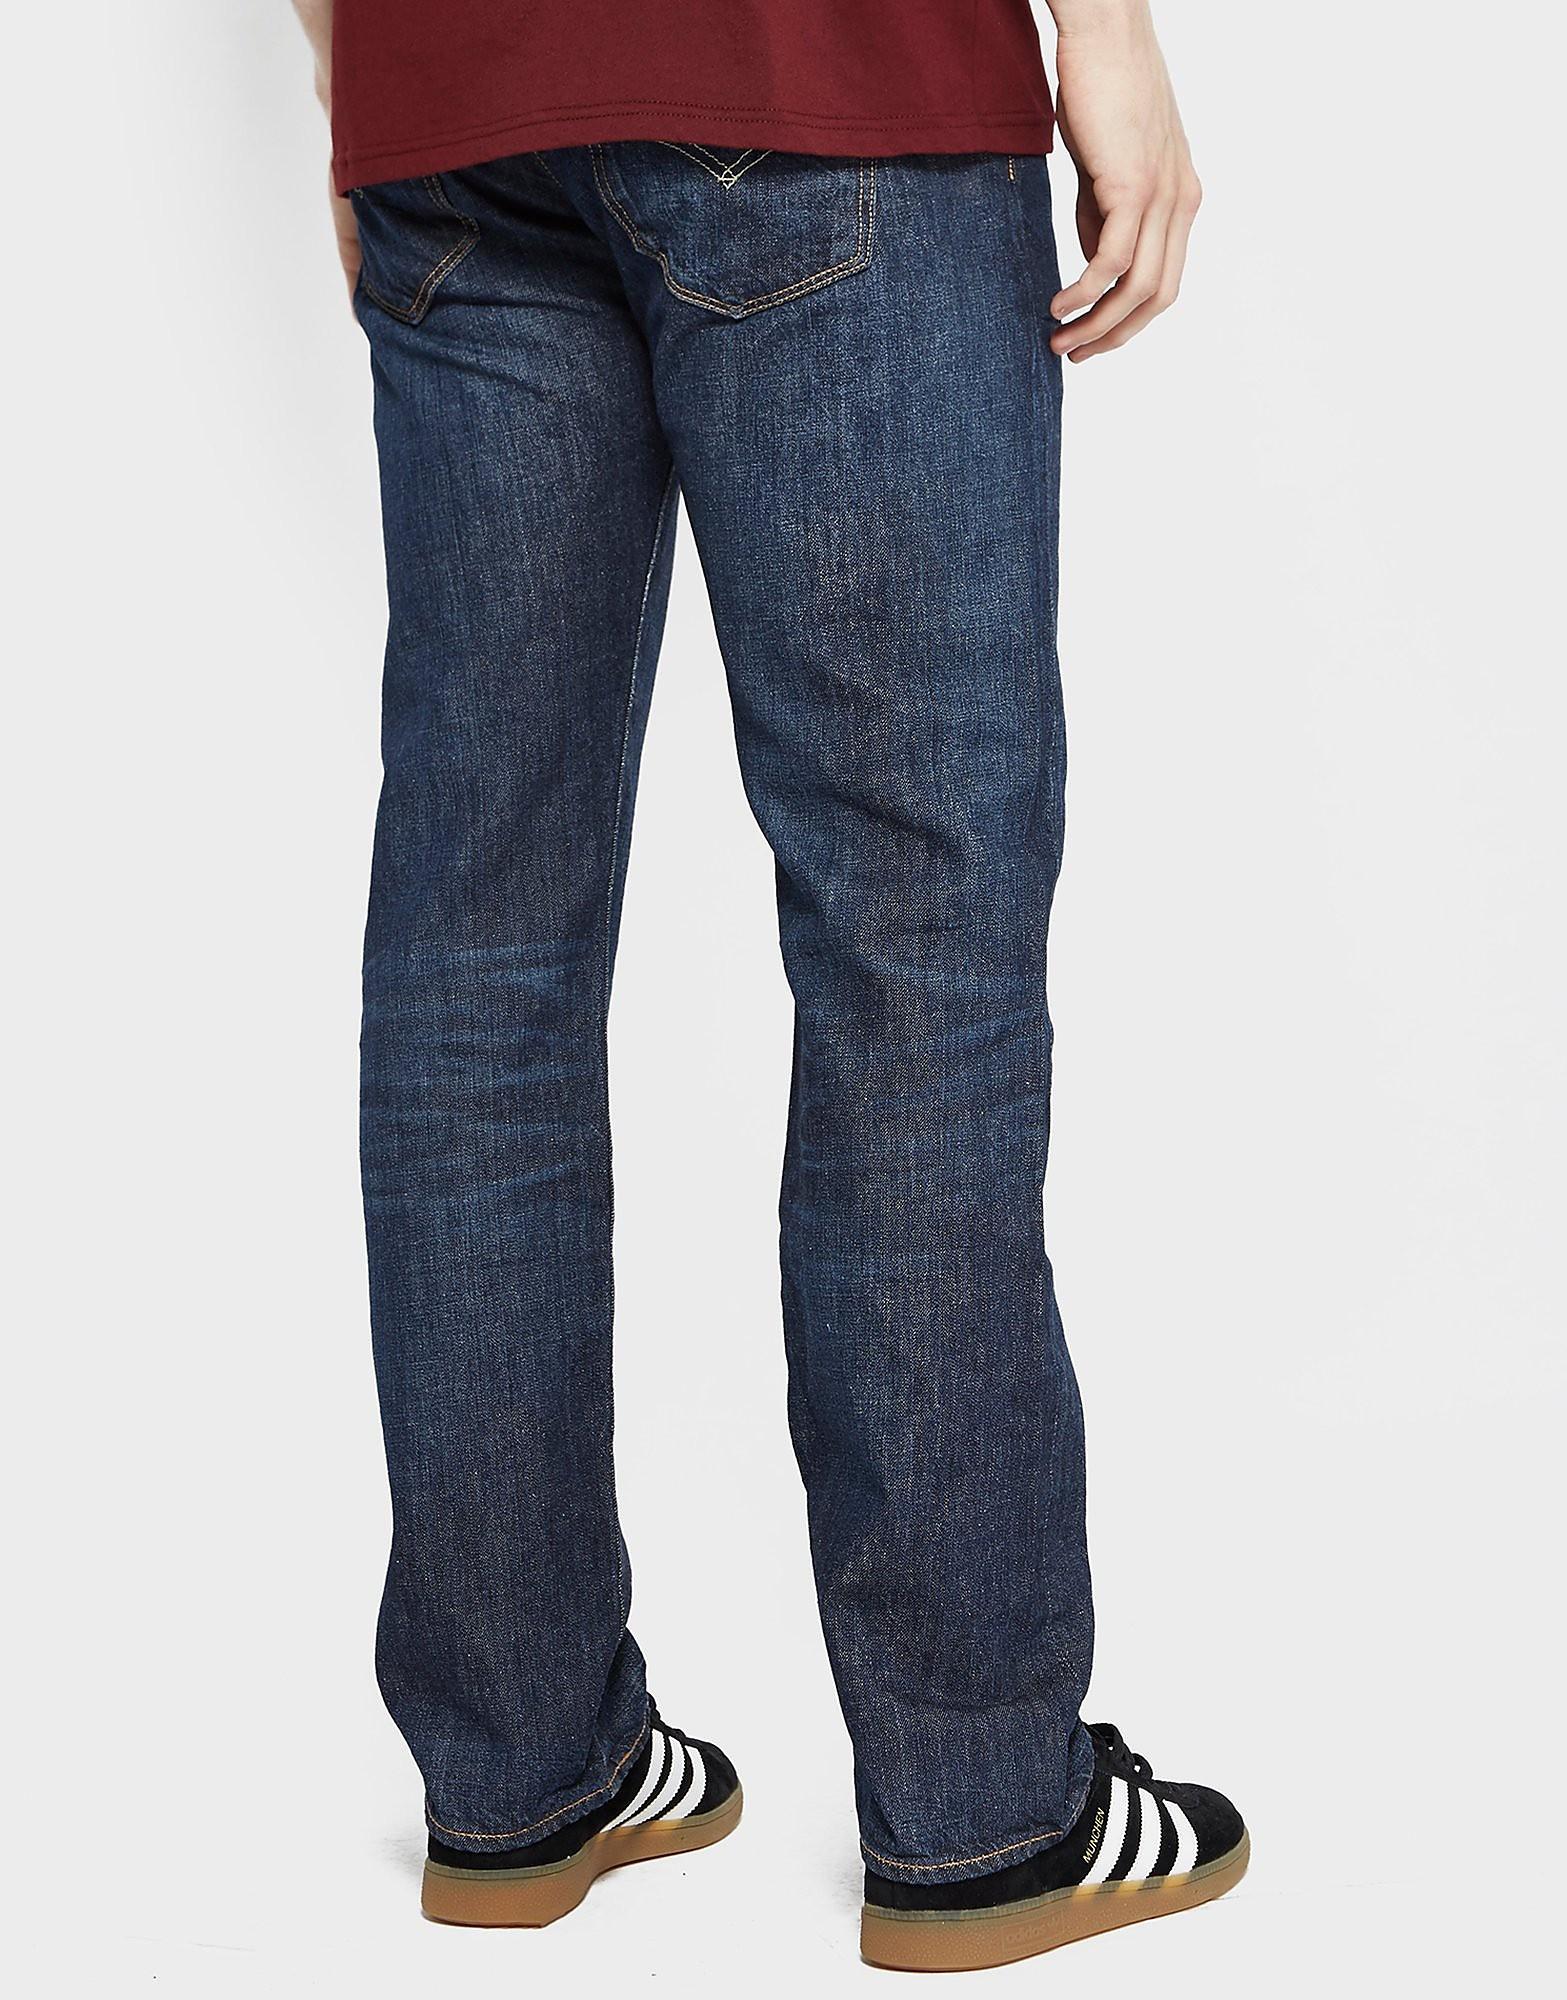 Levis 501 Regular Felton Jean